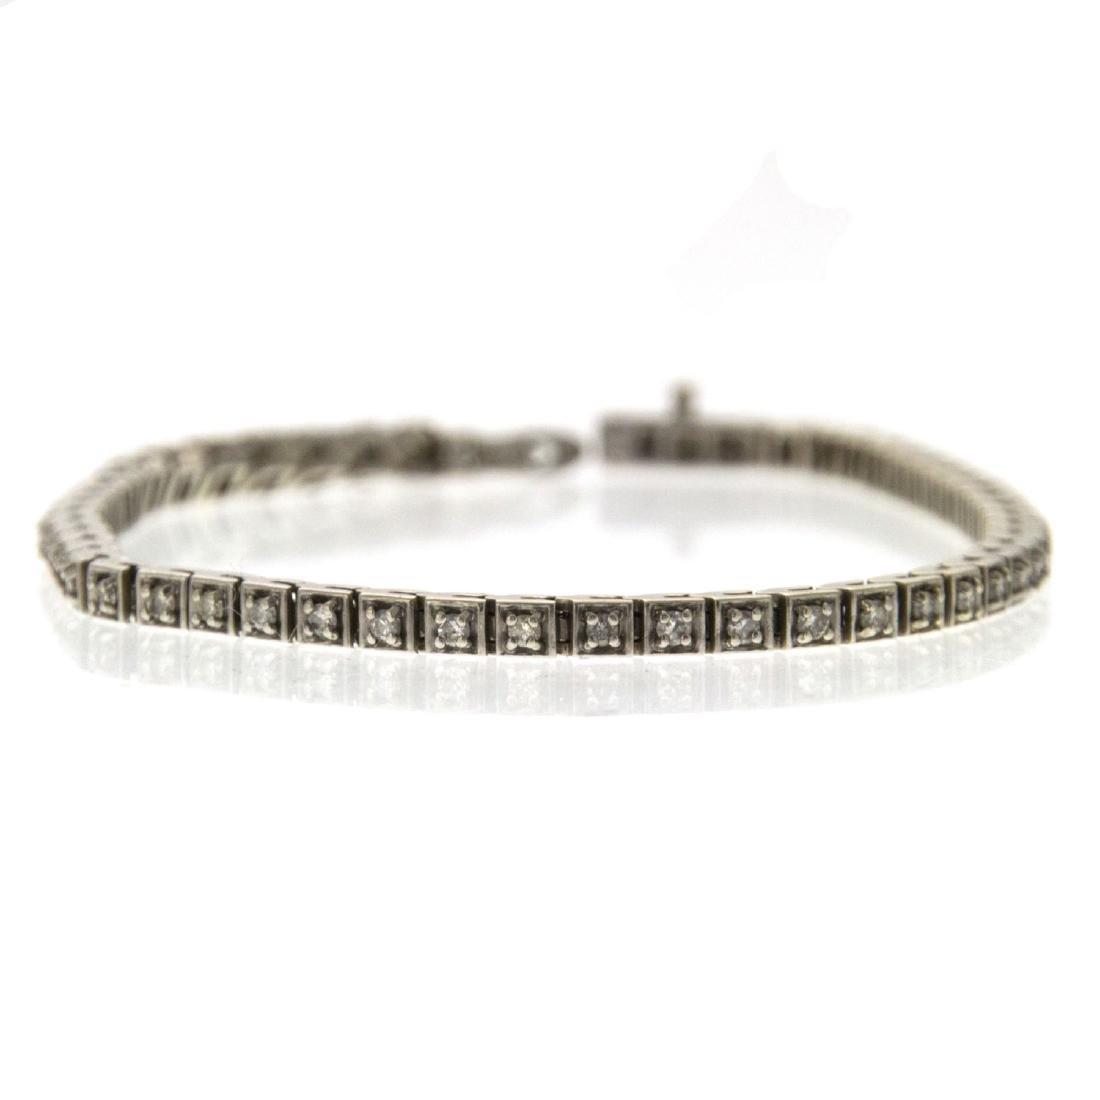 14k White Gold and Diamond Tennis Bracelet.